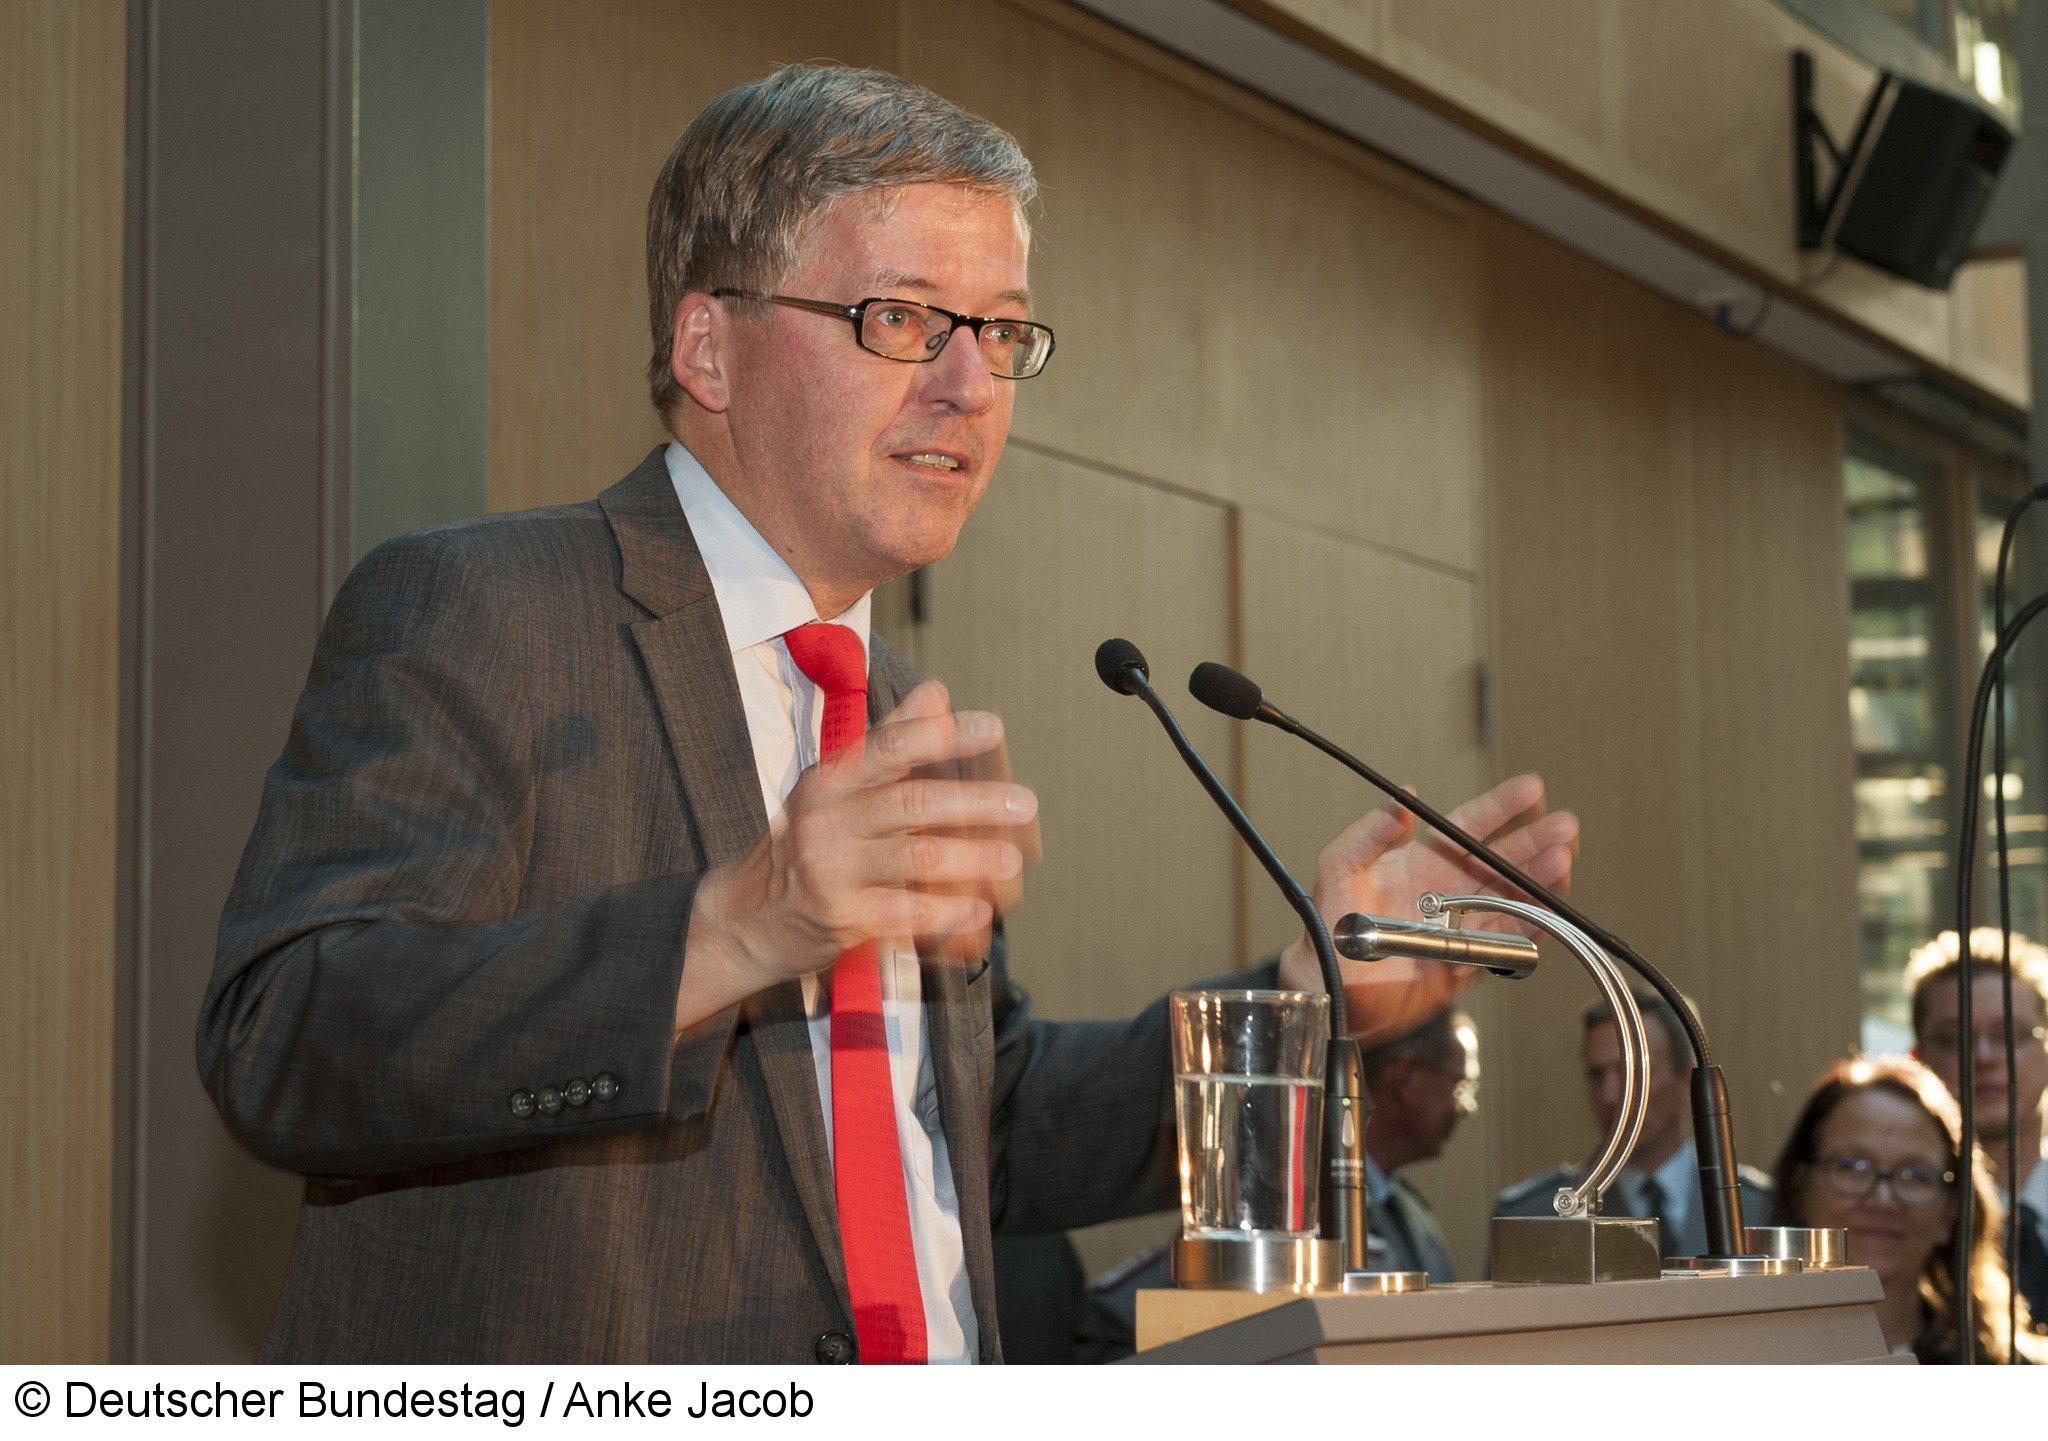 (c) Deutscher Bundestag / Anke Jacob